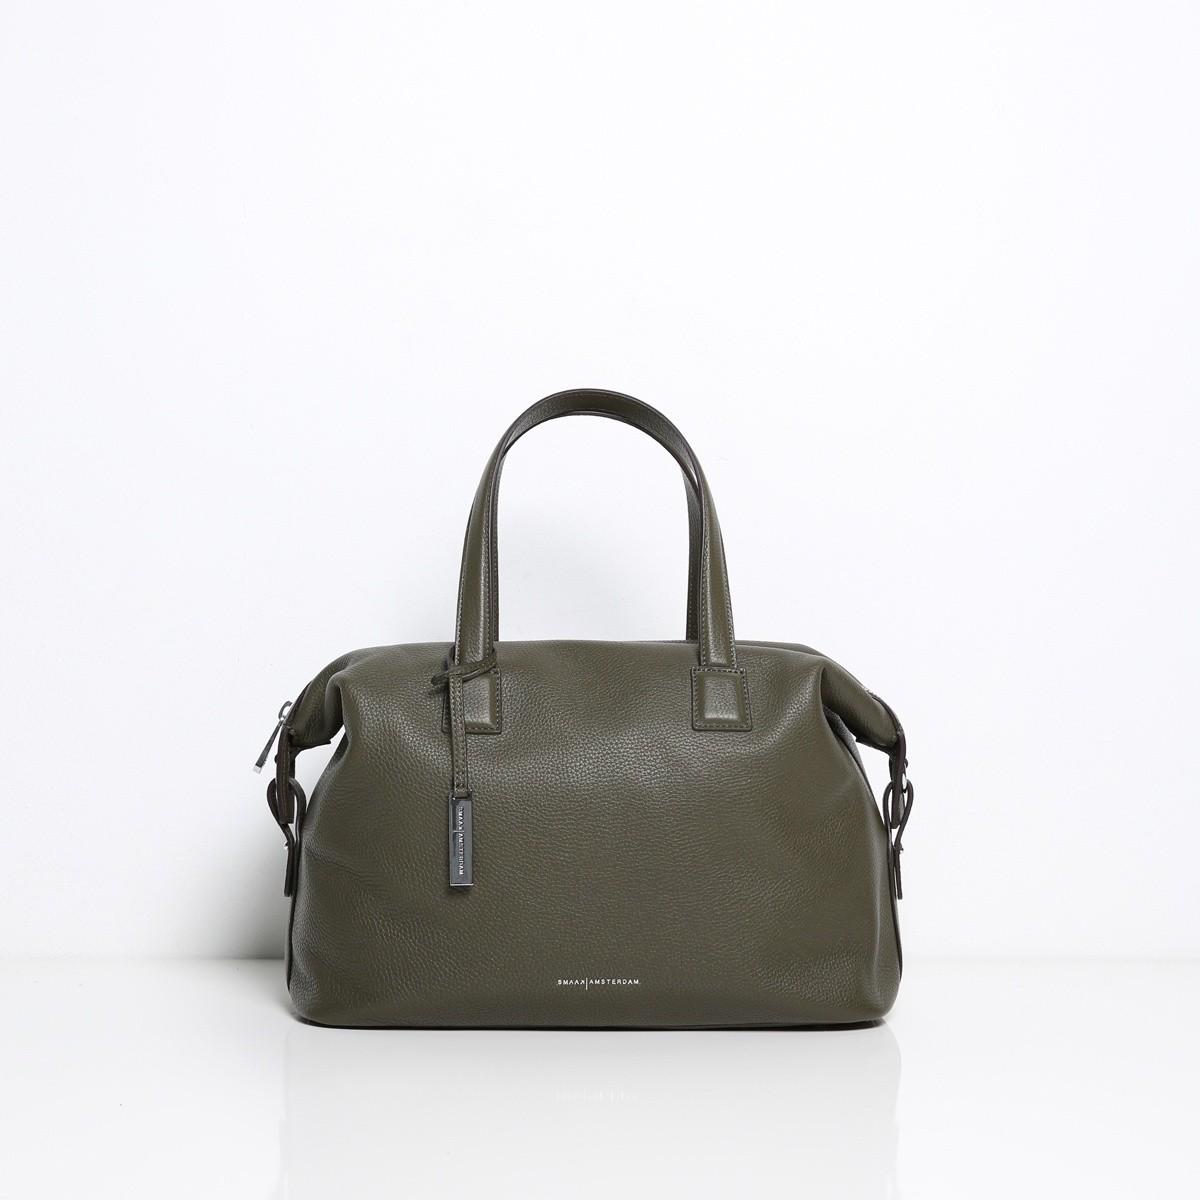 DIAPER BAG - ARMY GREEN